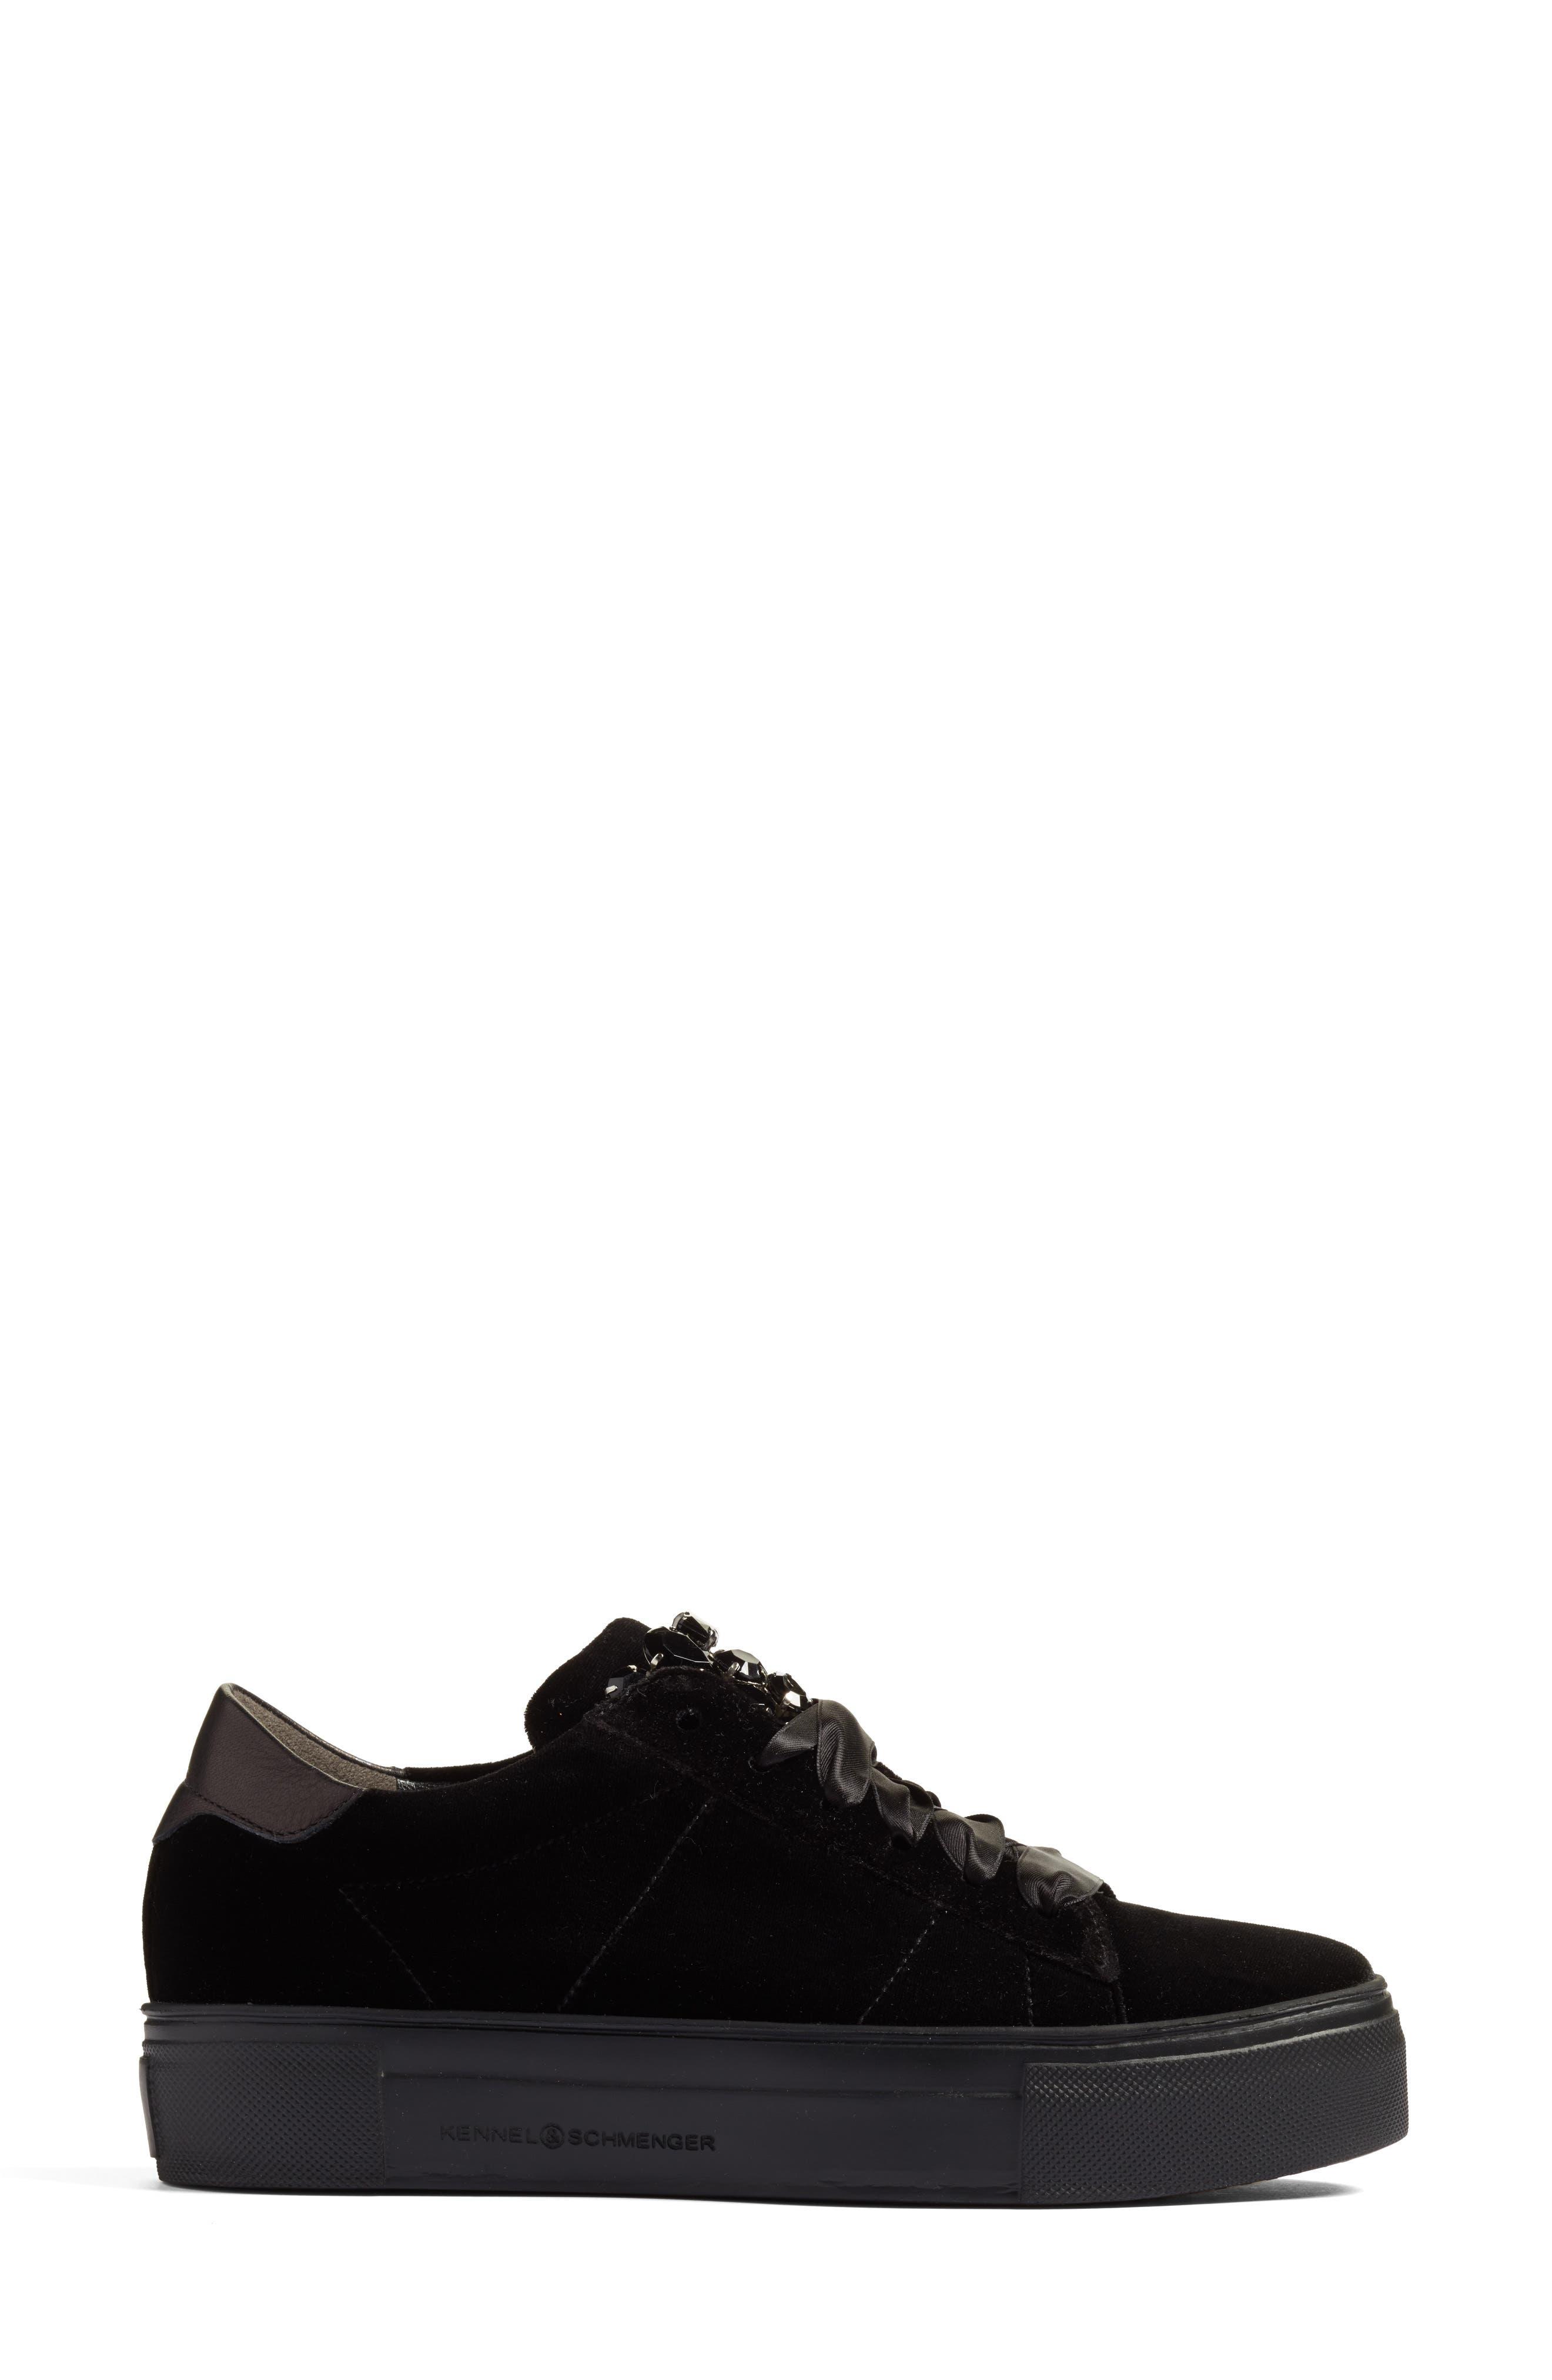 Kennel & Schmenger Big Velvet Lace-Up Sneaker,                             Alternate thumbnail 3, color,